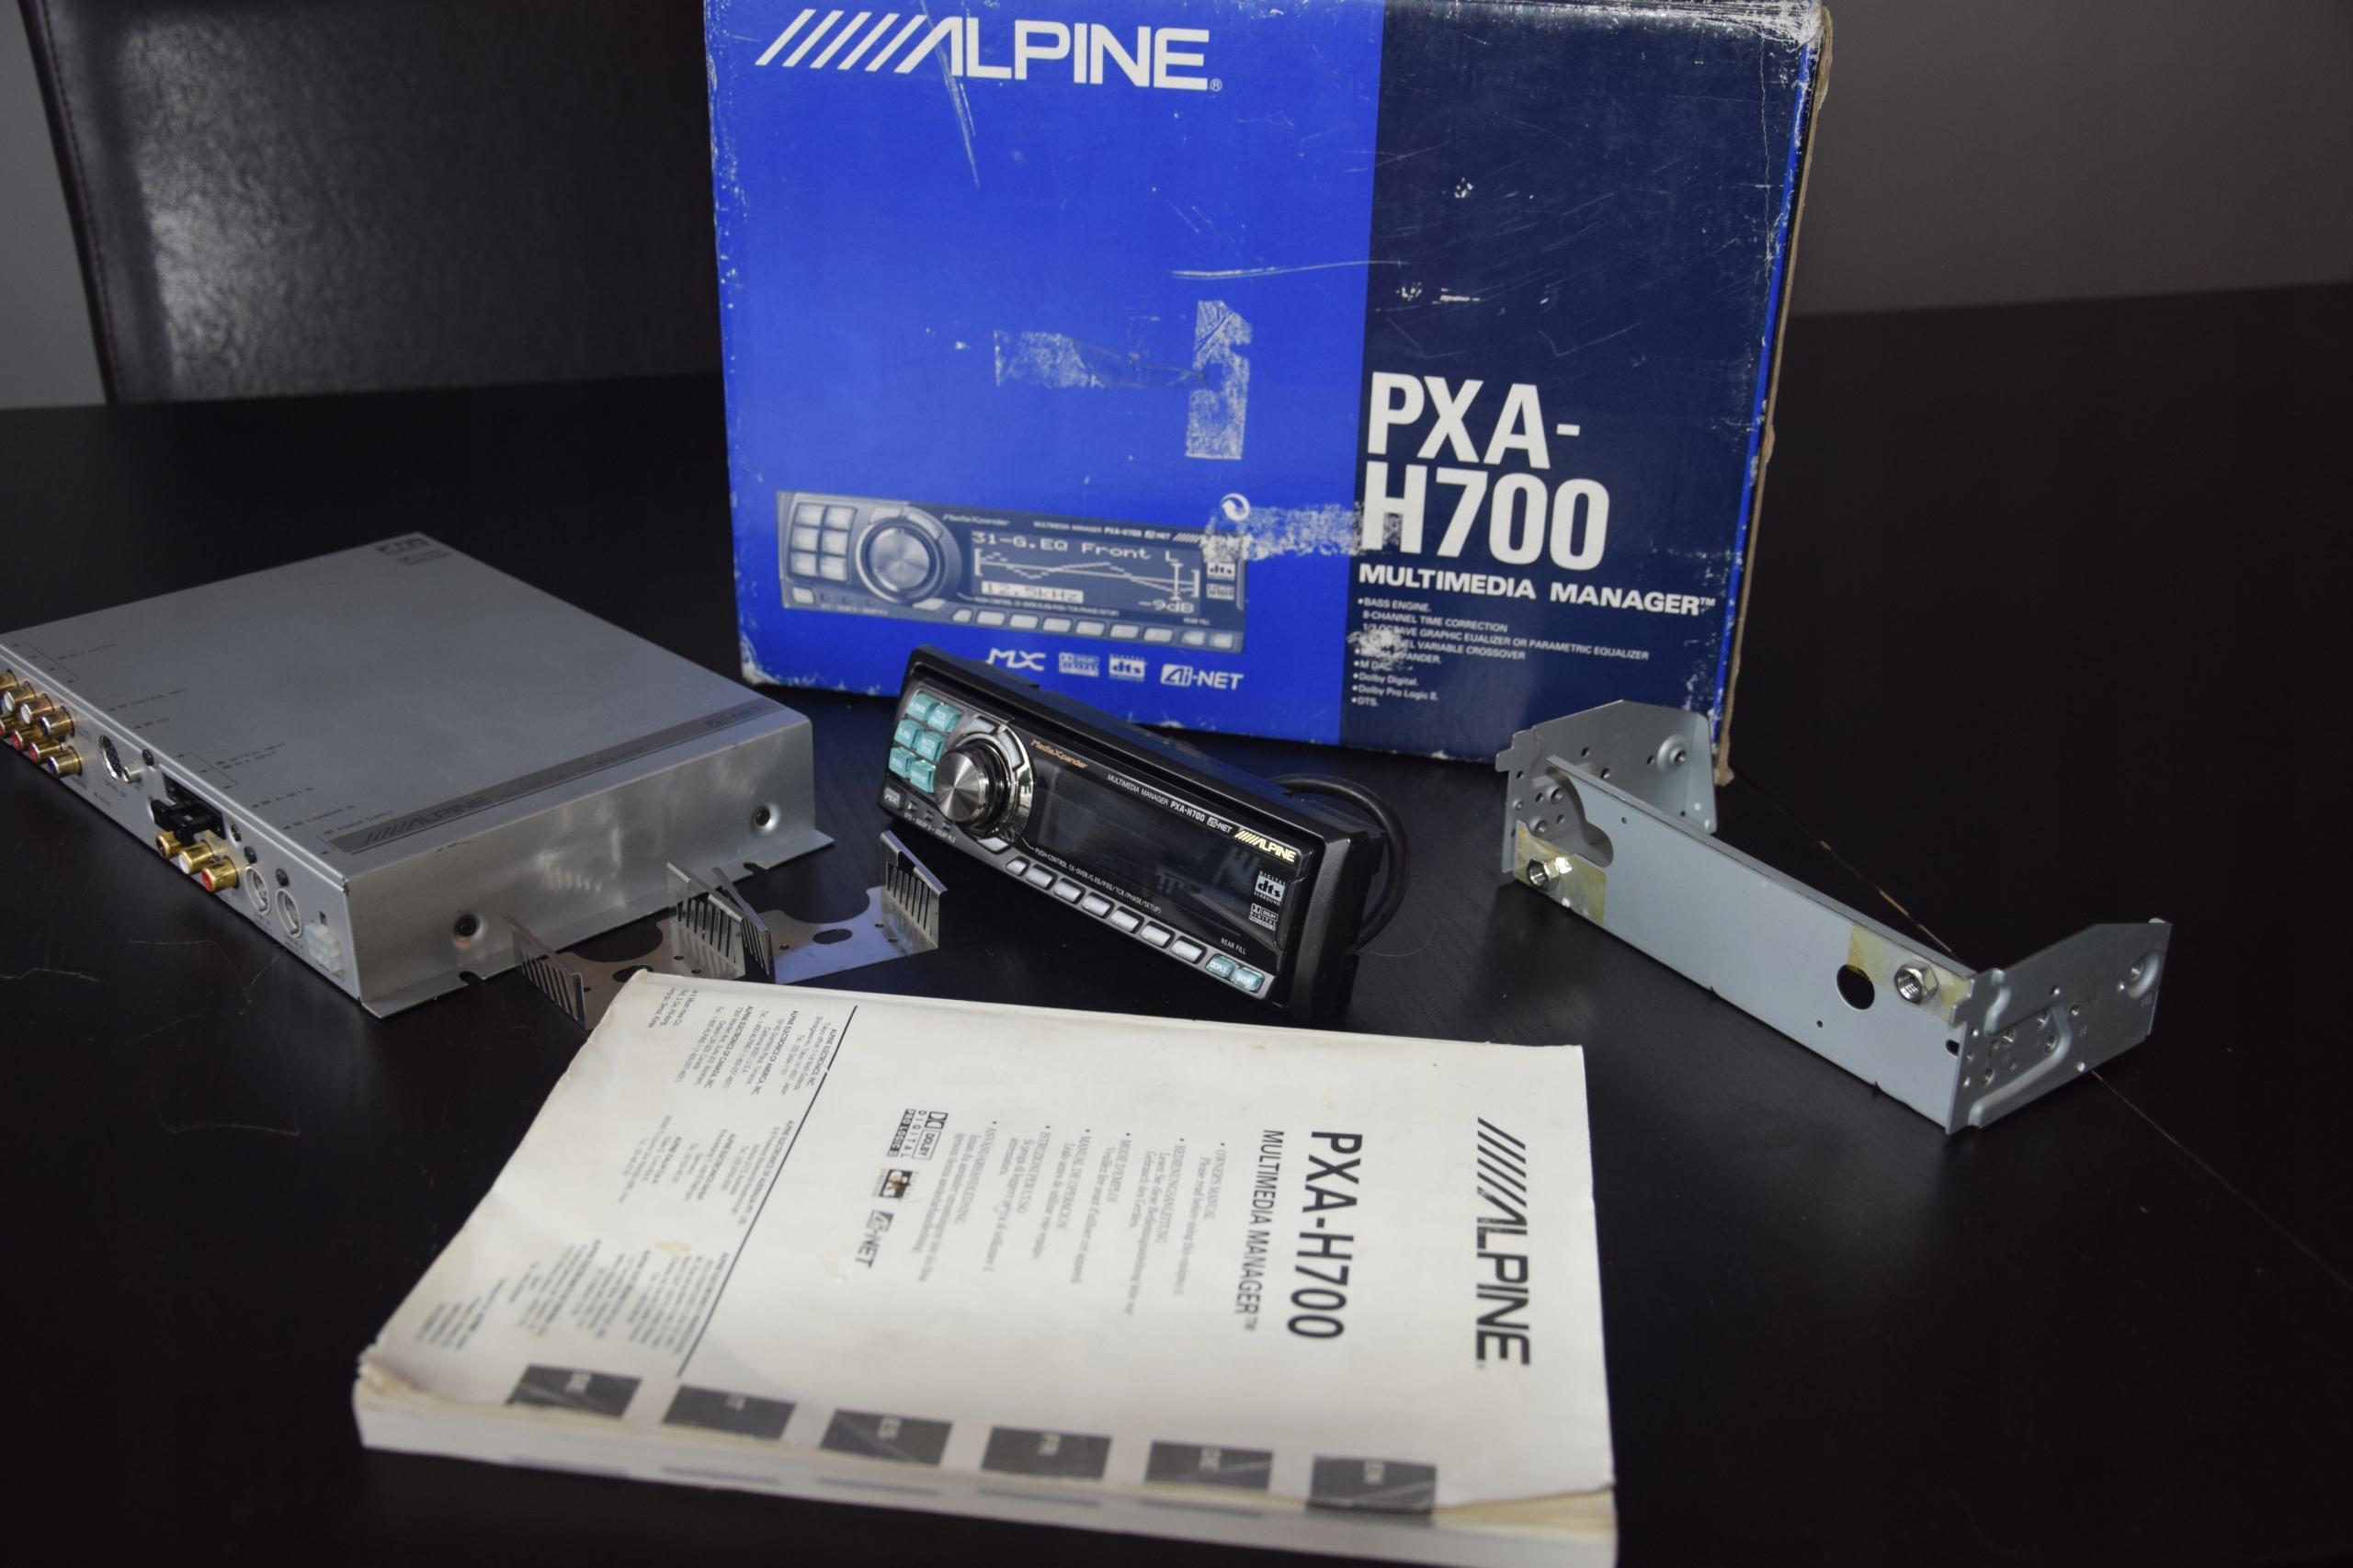 procesor dżwięku ALPINE PXA-H700 + RUX h700